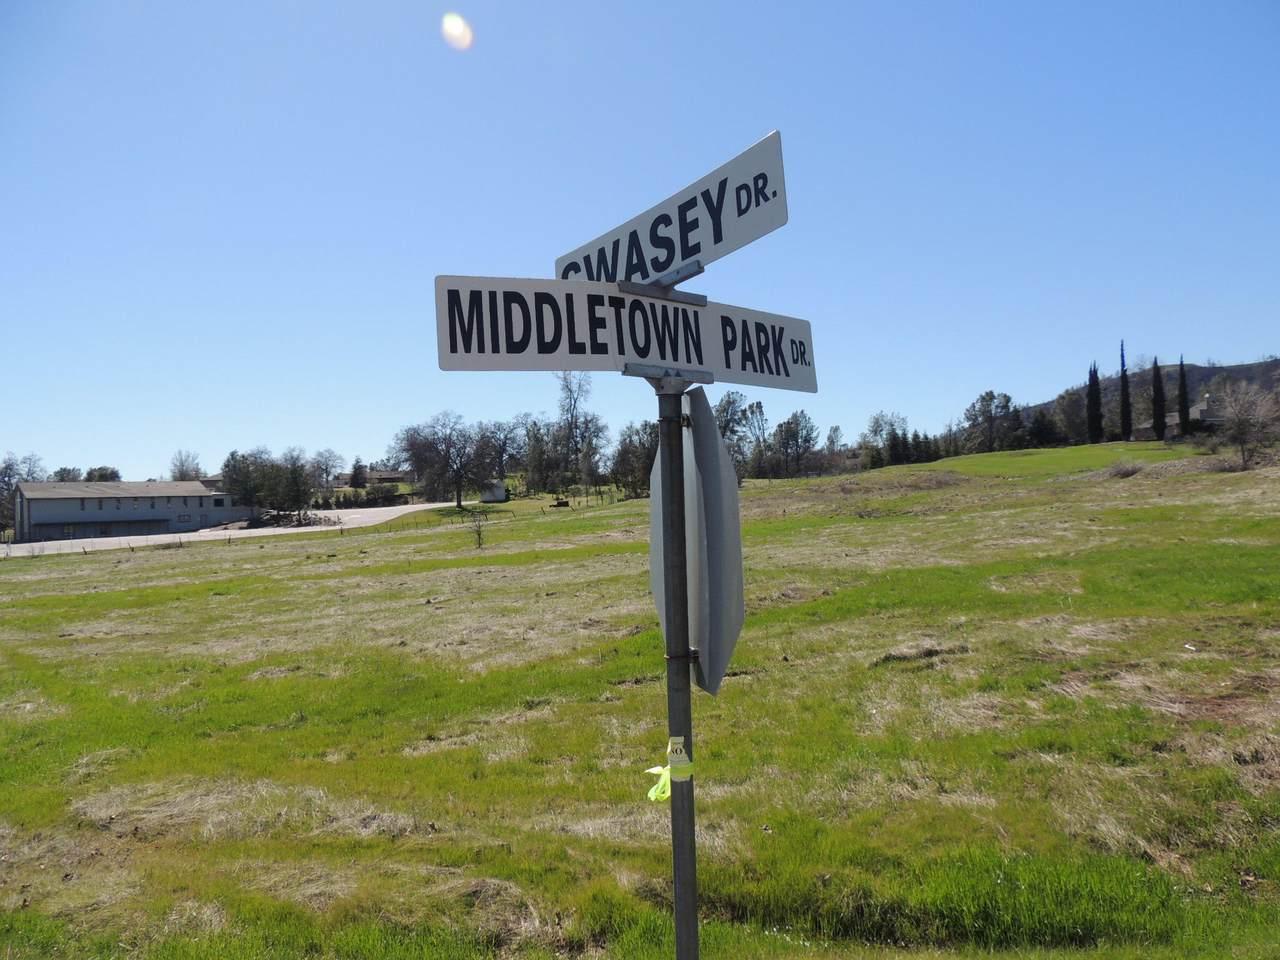 15608 Middletown Park Dr - Photo 1